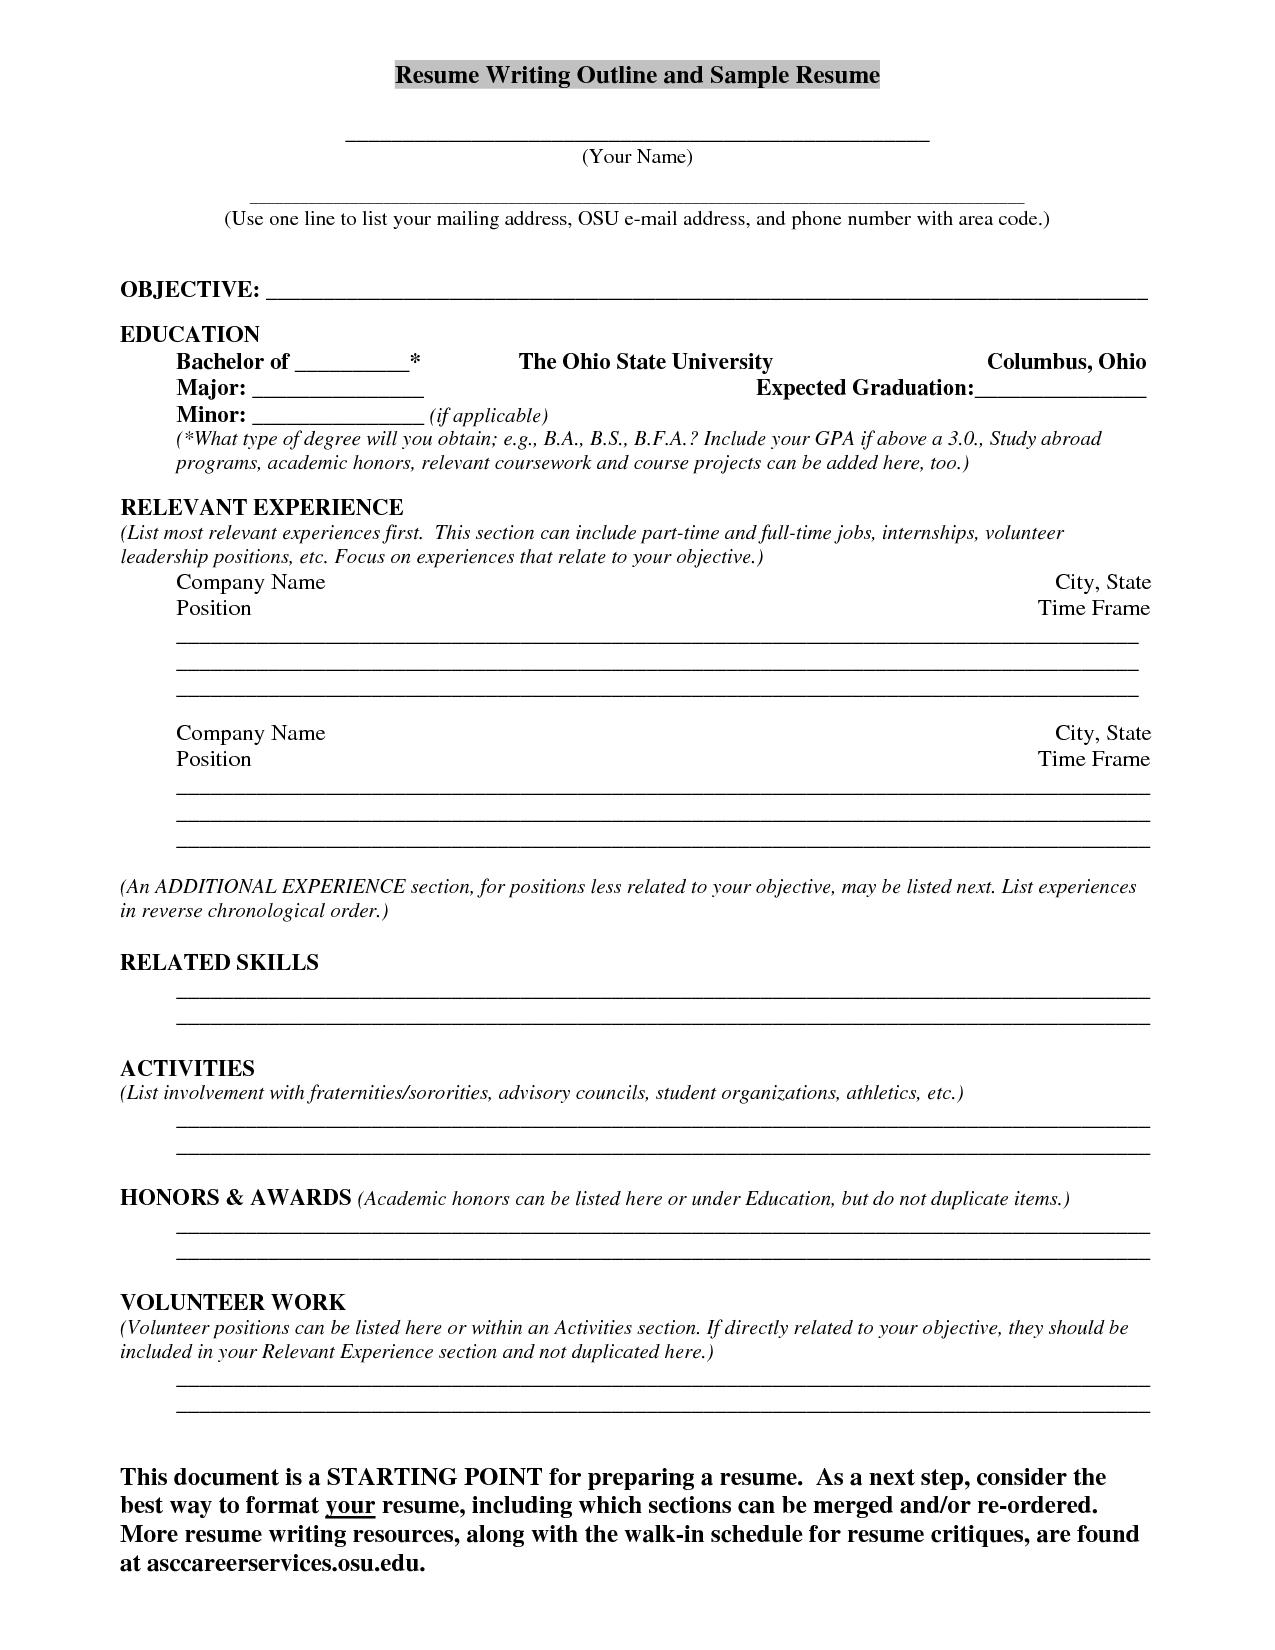 Relevant Coursework Resume Bullet